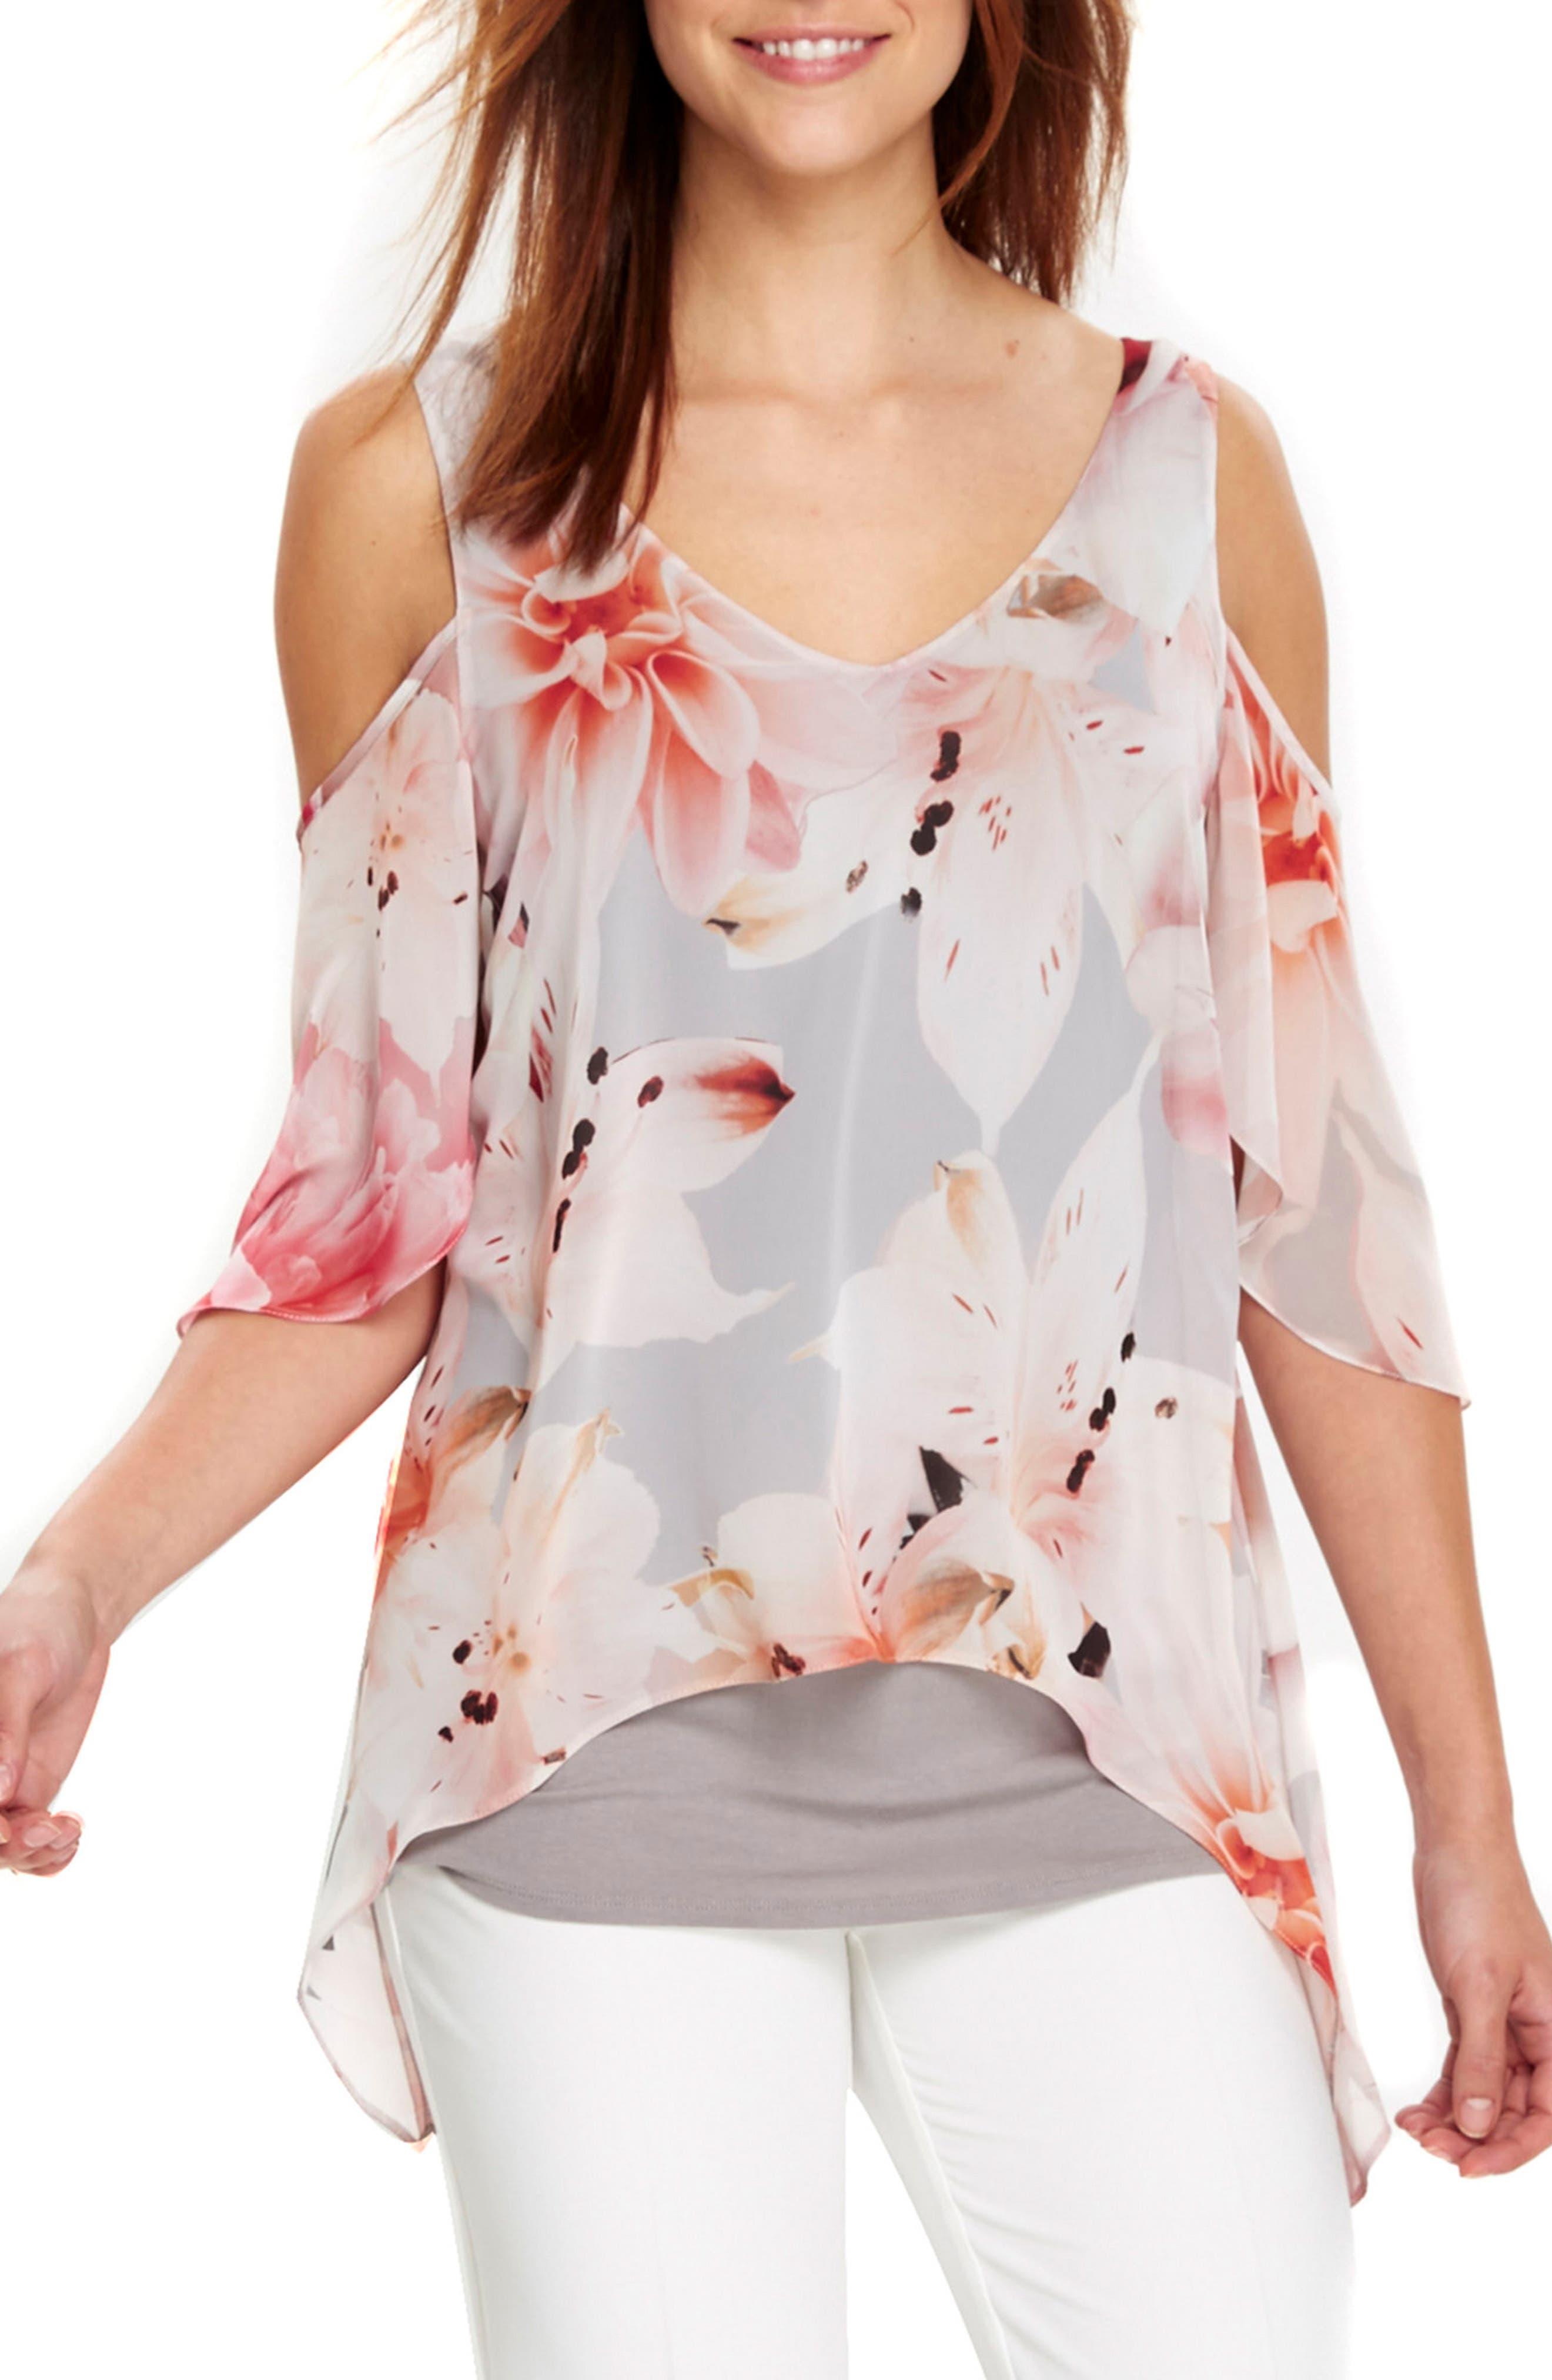 Main Image - Wallis Apricot Lily Cold Shoulder Top